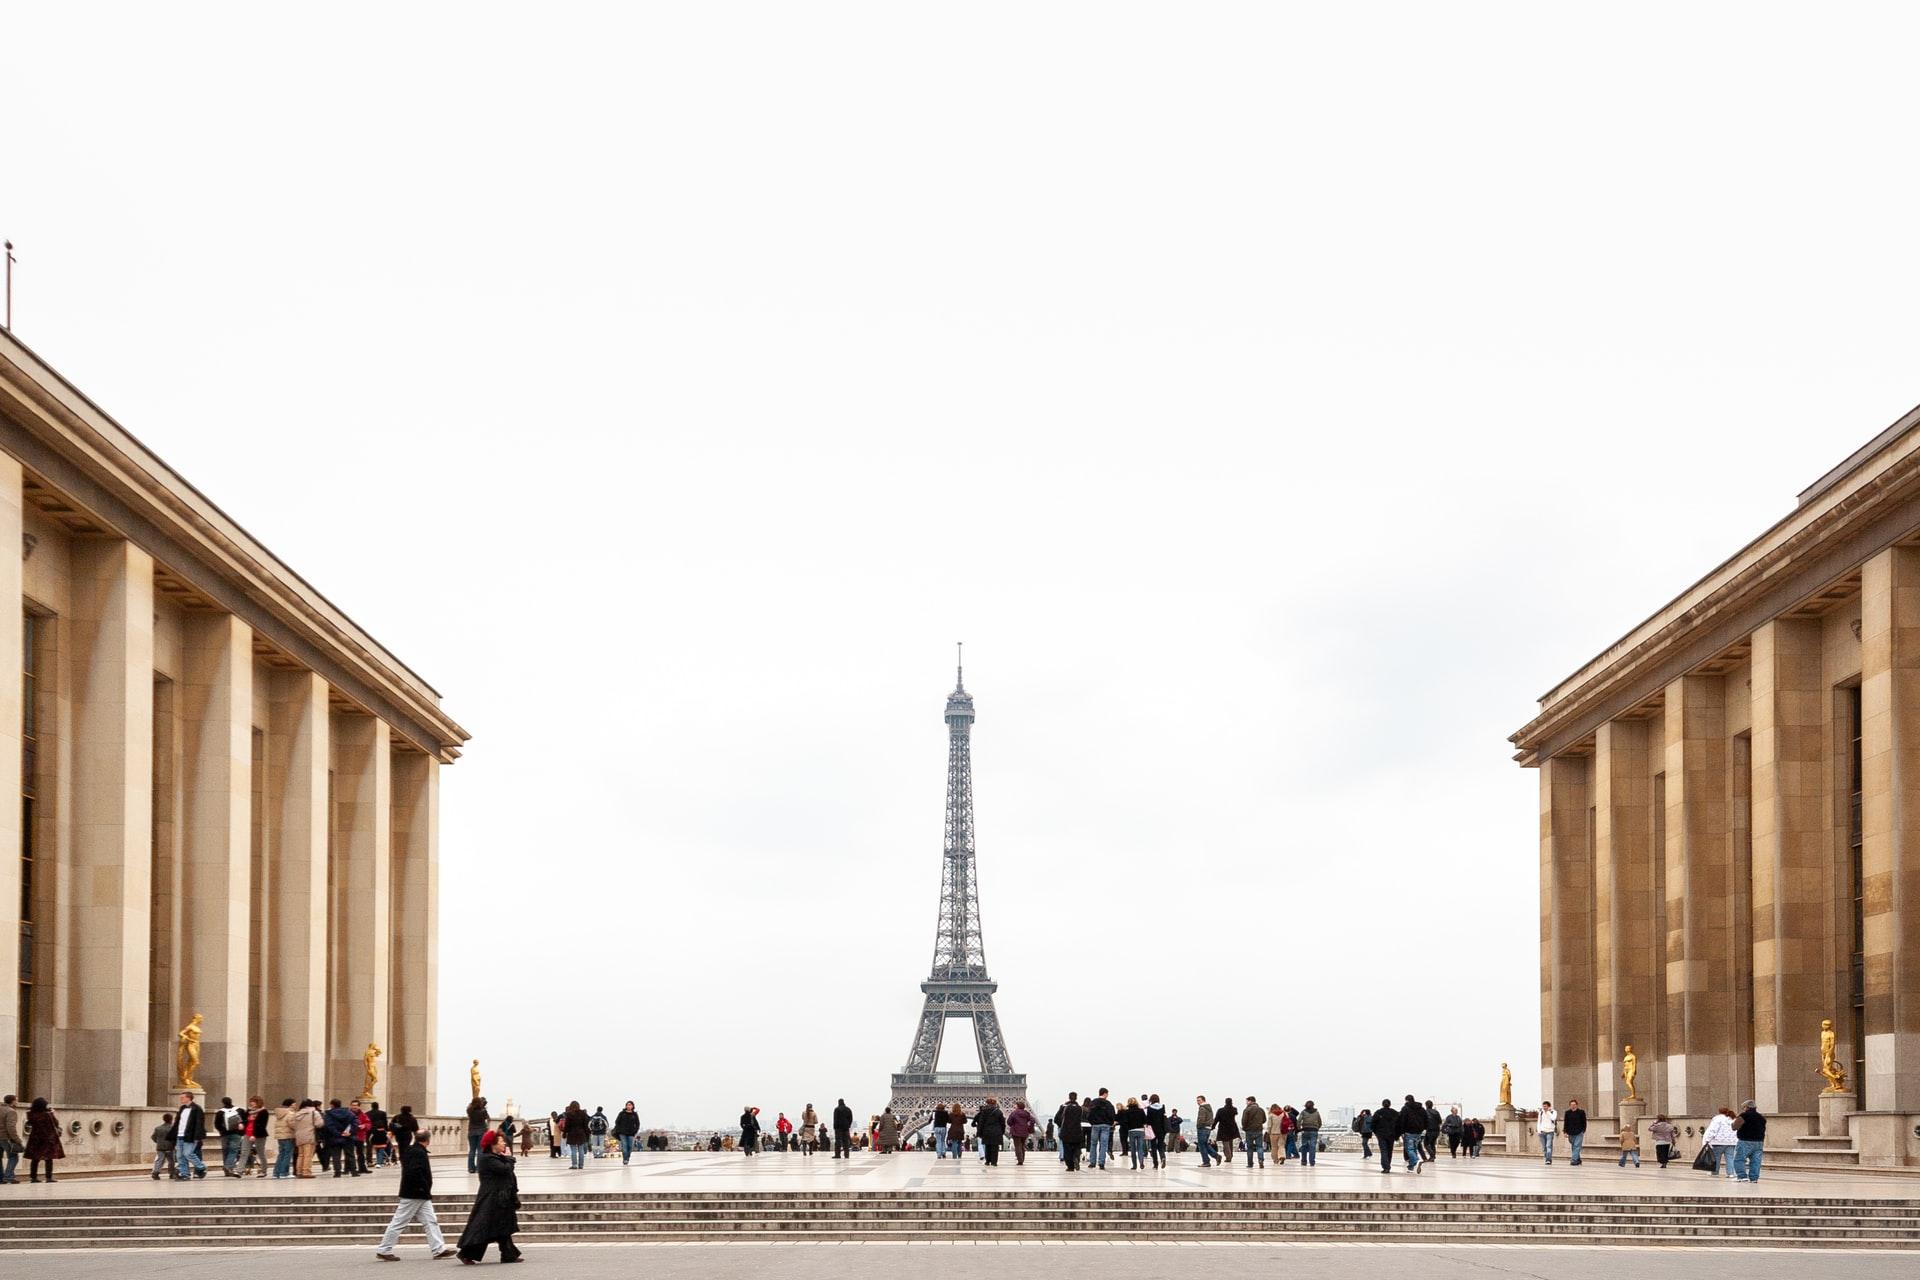 Eiffel Tower romantic viewpoint